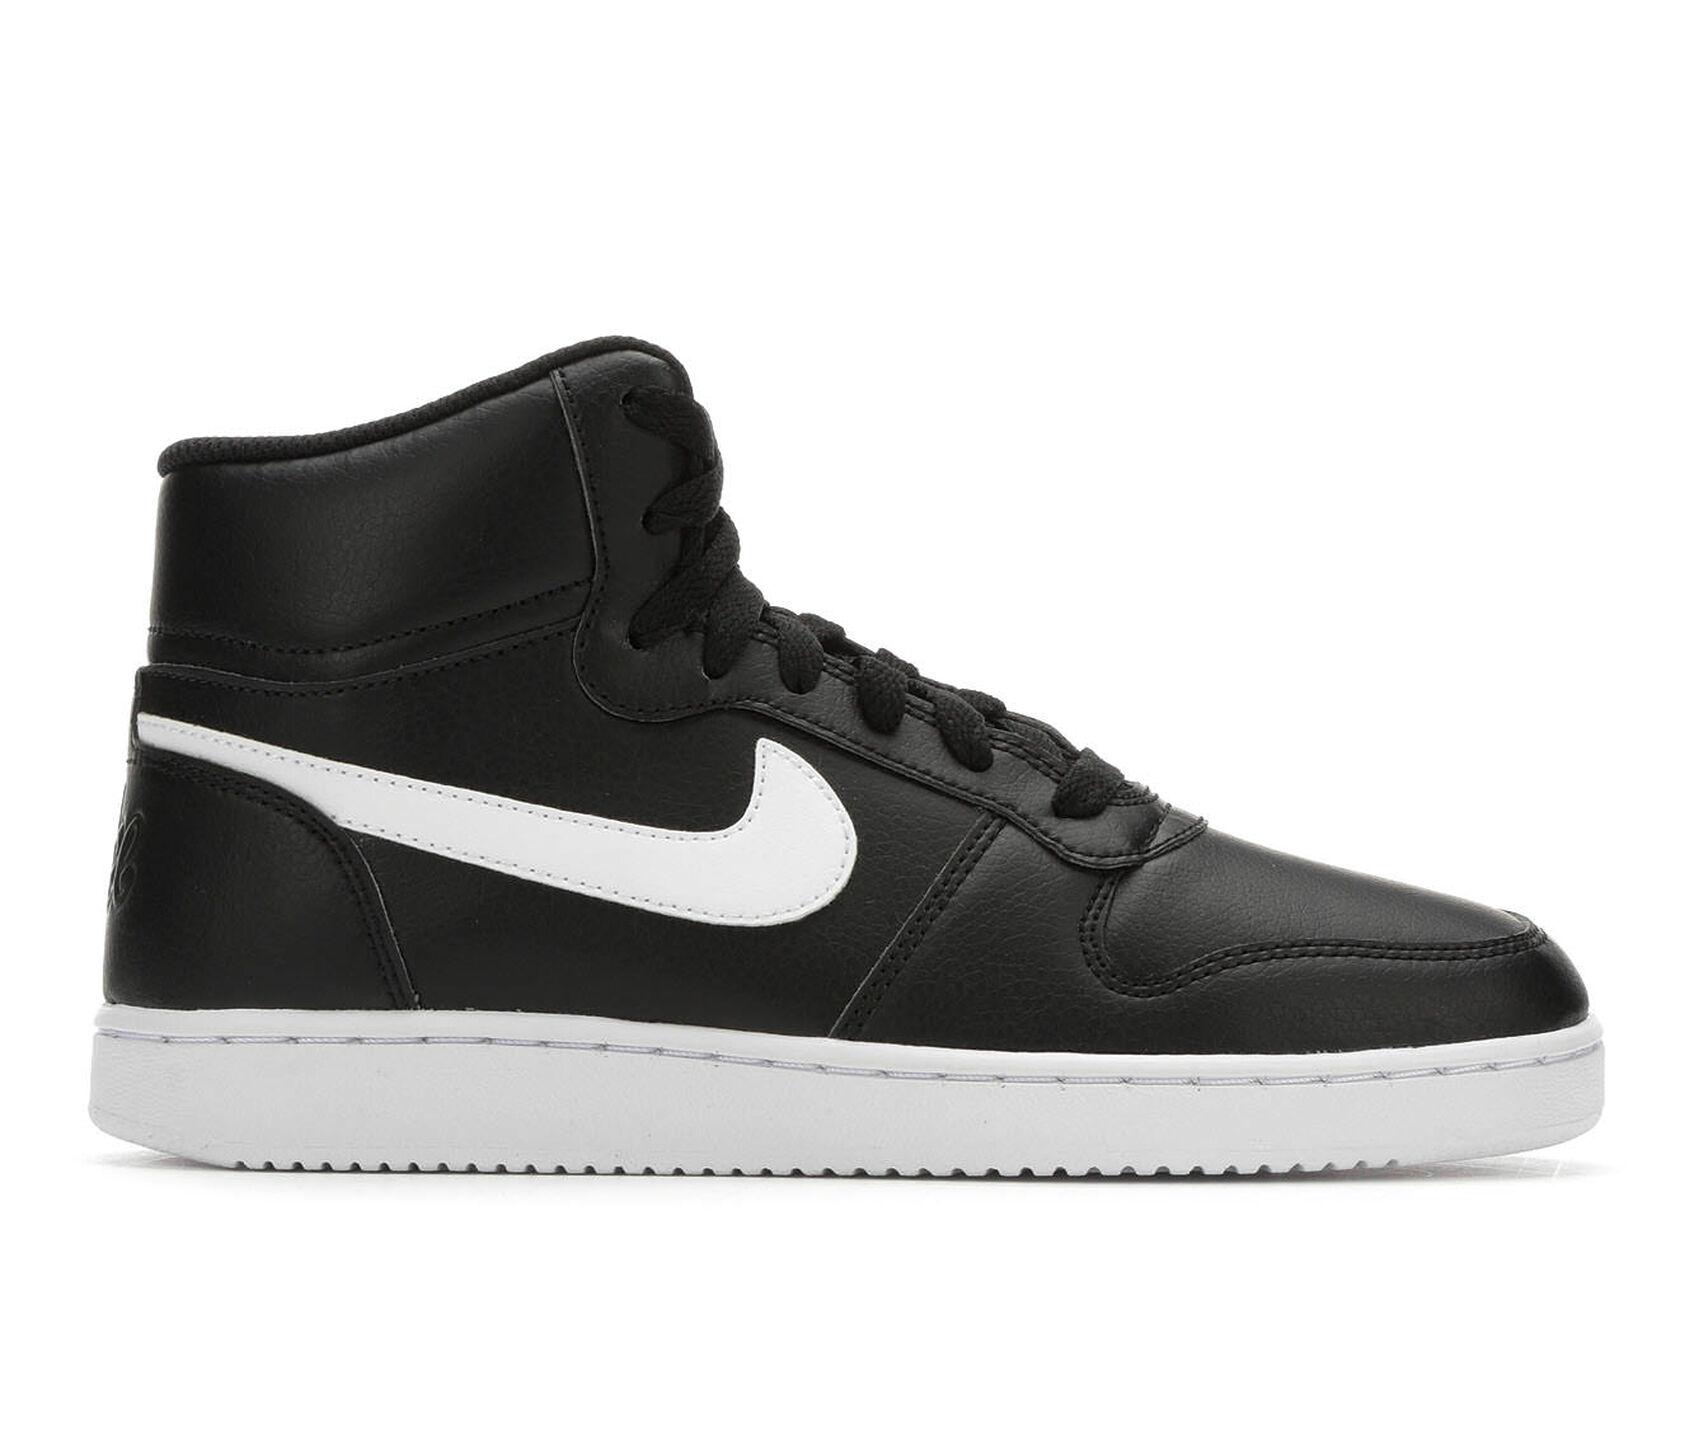 4550f90e2f8a ... Nike Ebernon Mid Fashion Basketball Shoes. Previous